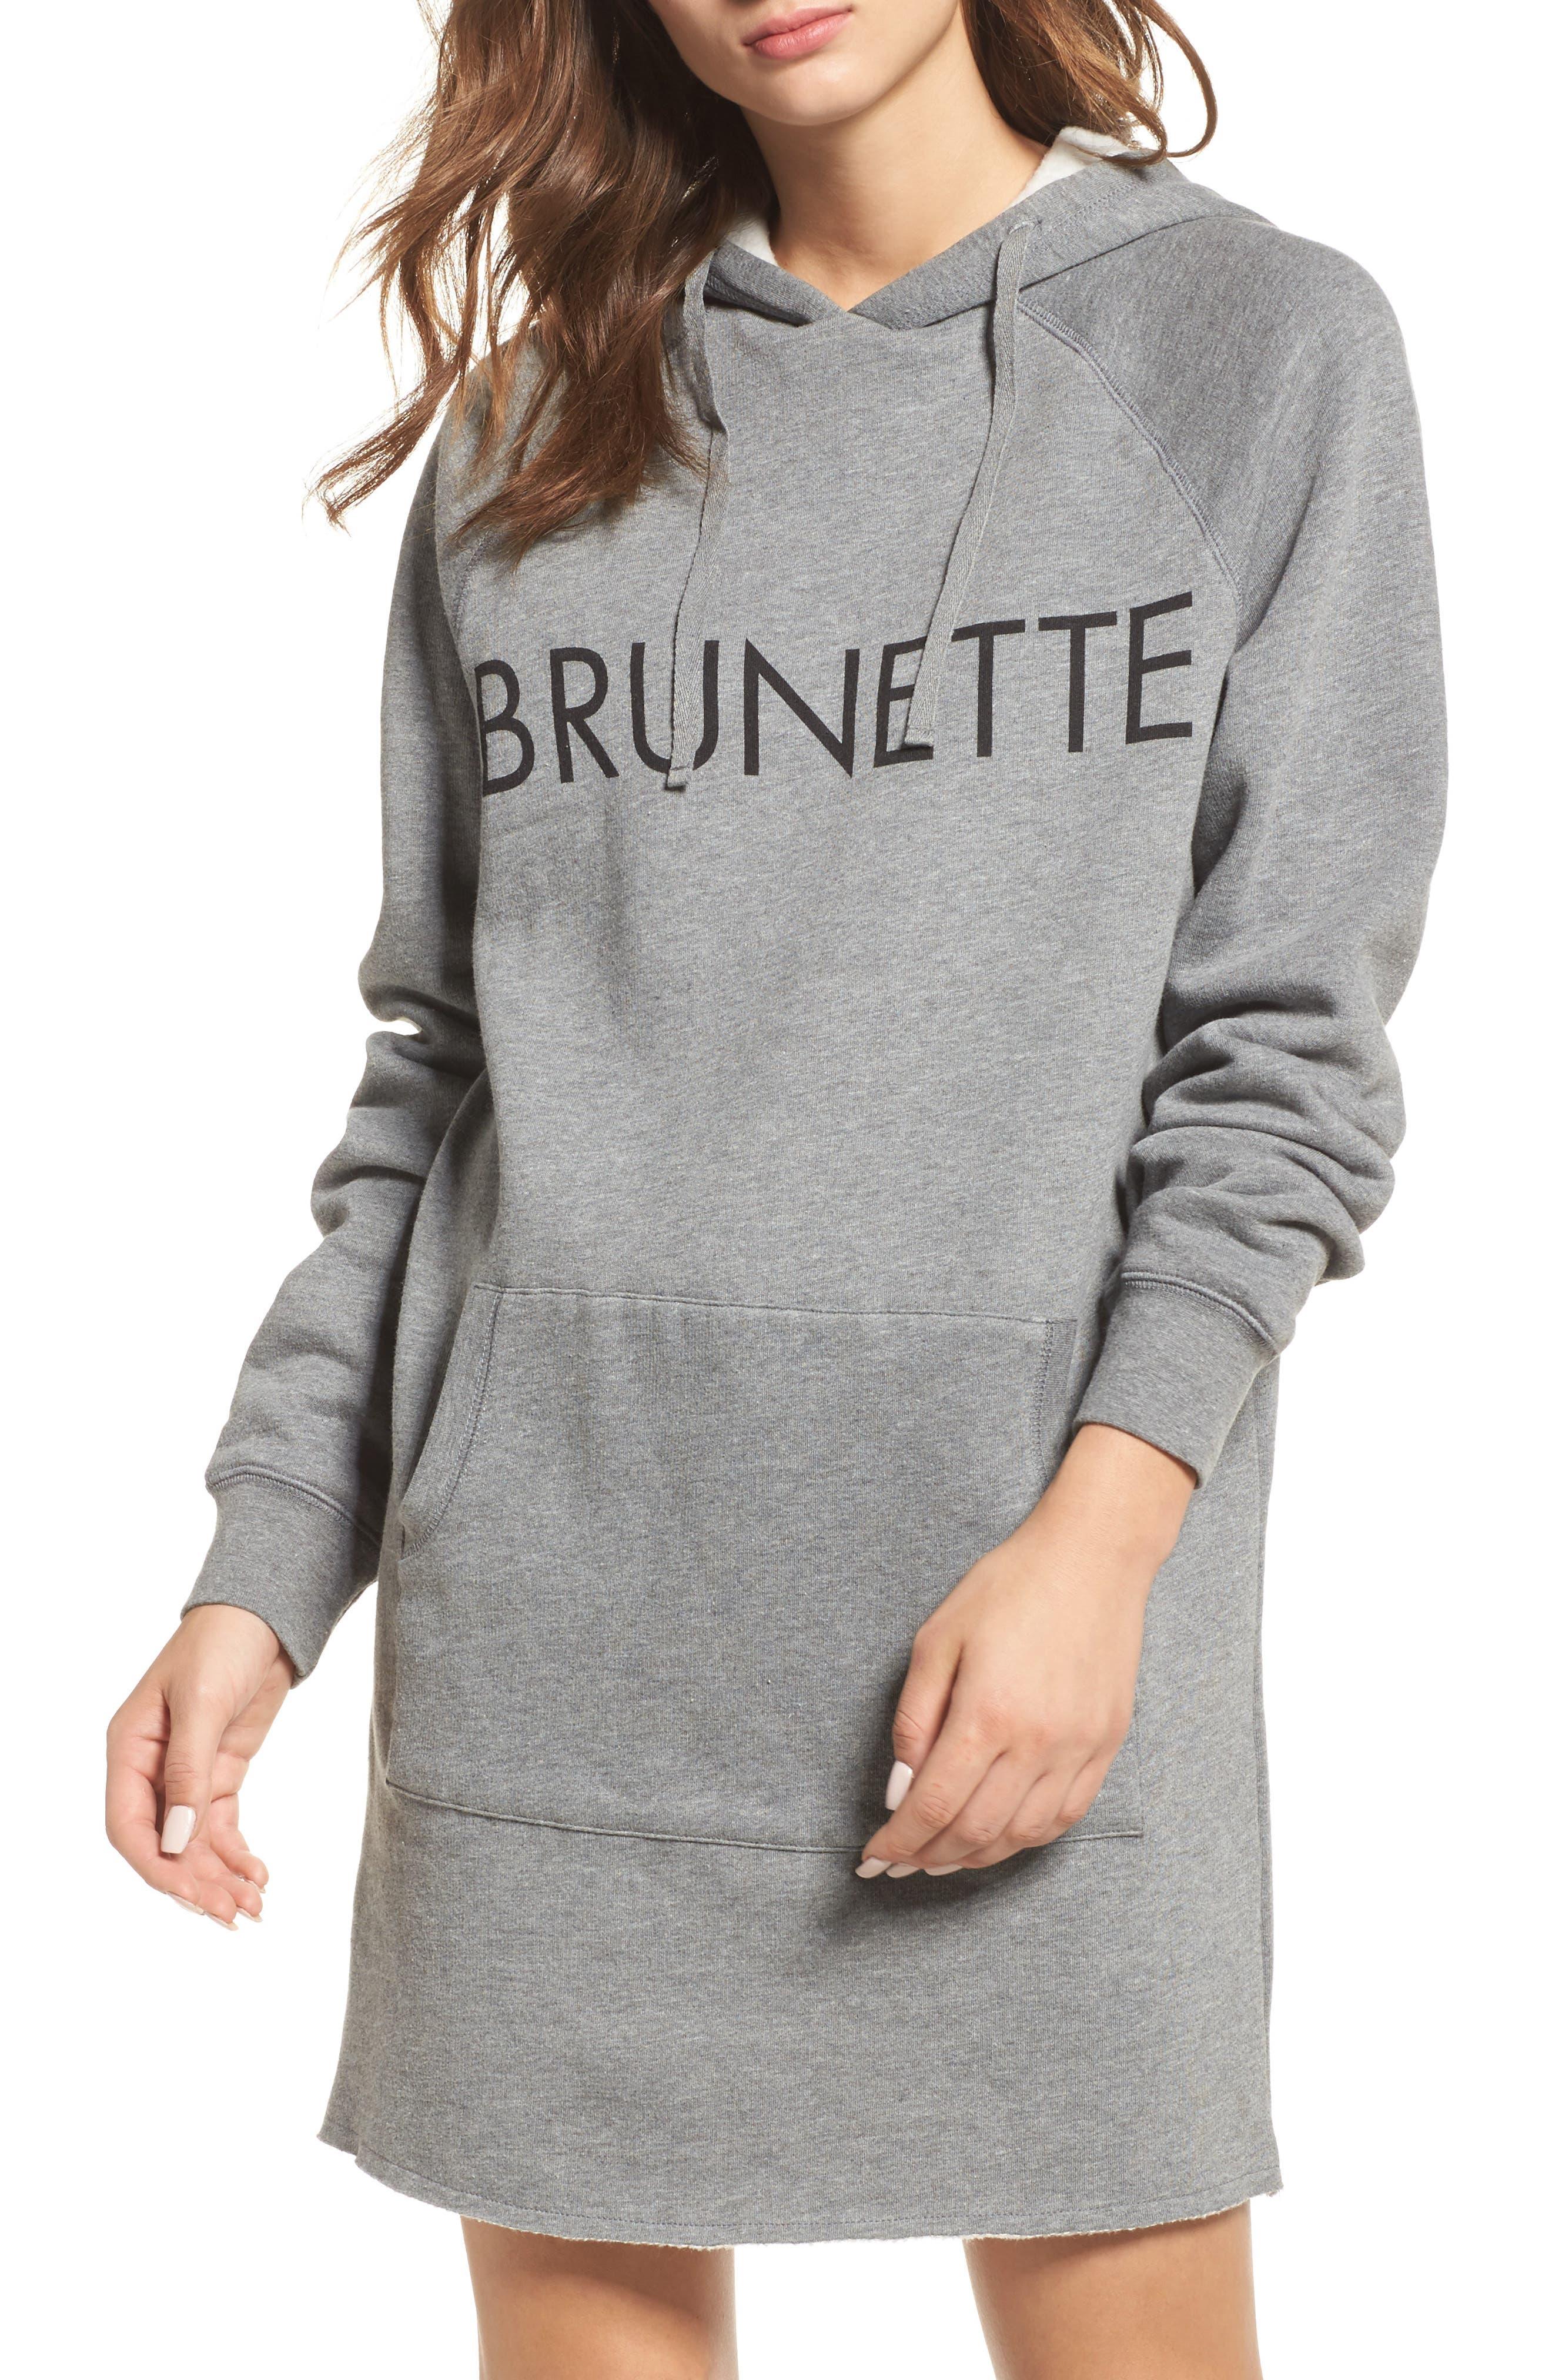 Main Image - BRUNETTE the Label Brunette Sweatshirt Dress